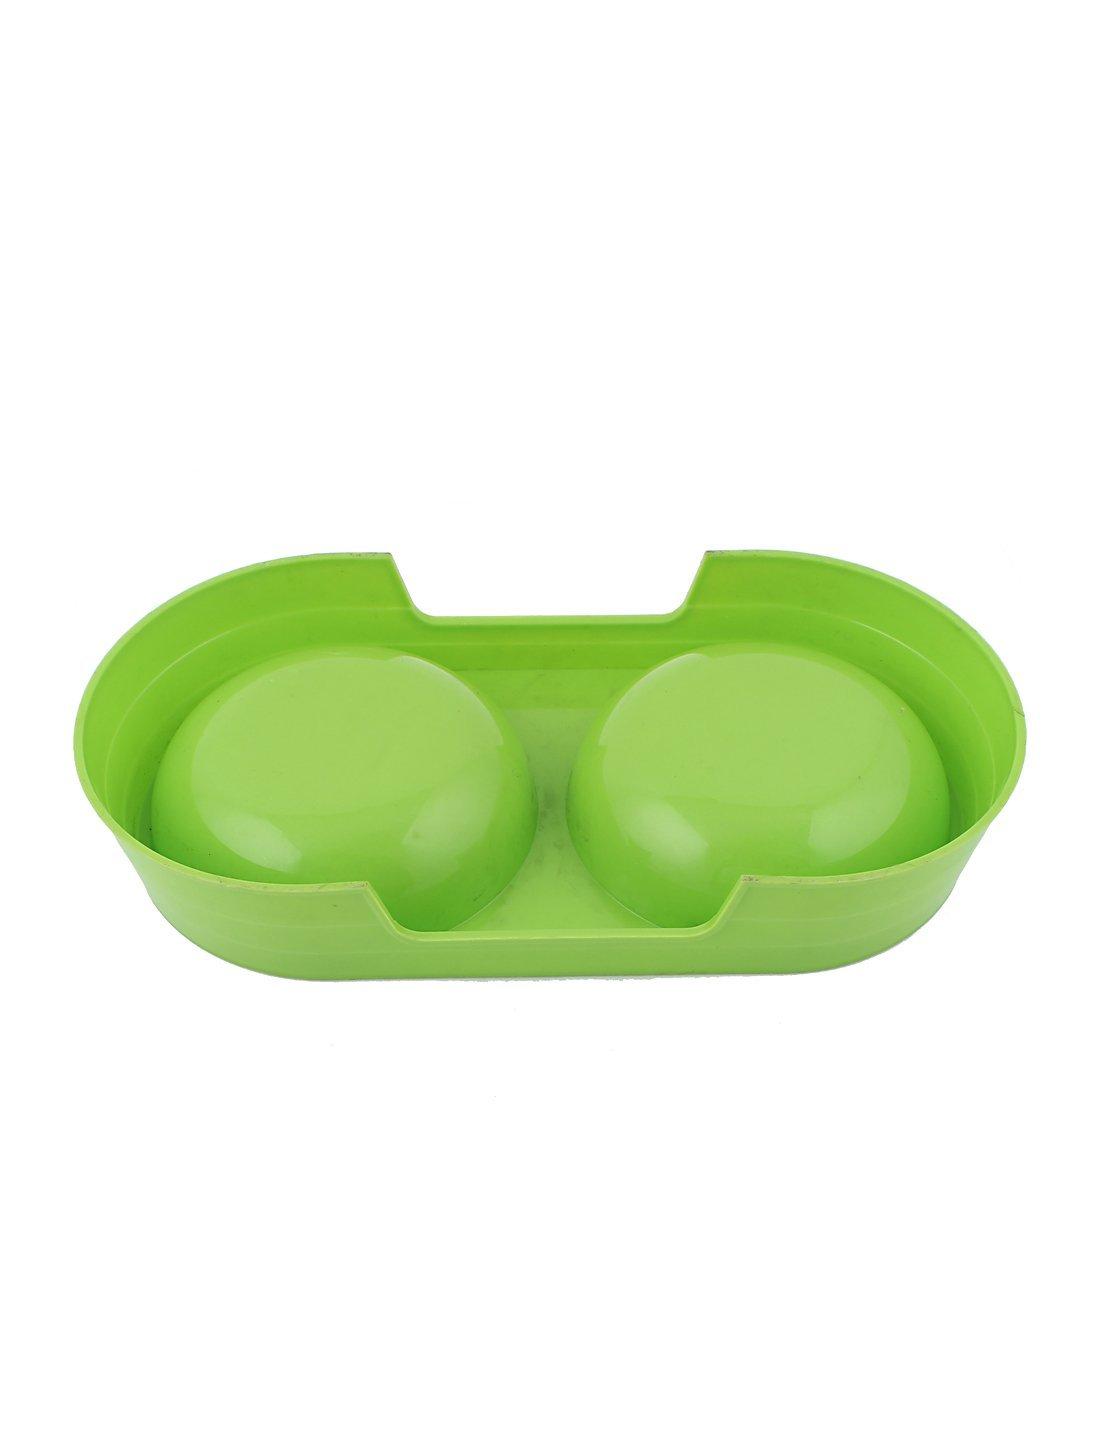 Amazon.com: eDealMax Perro de mascota perrito de plástico de Doble alimentador del agua Alimentación Alimentación Bowl Verde: Pet Supplies